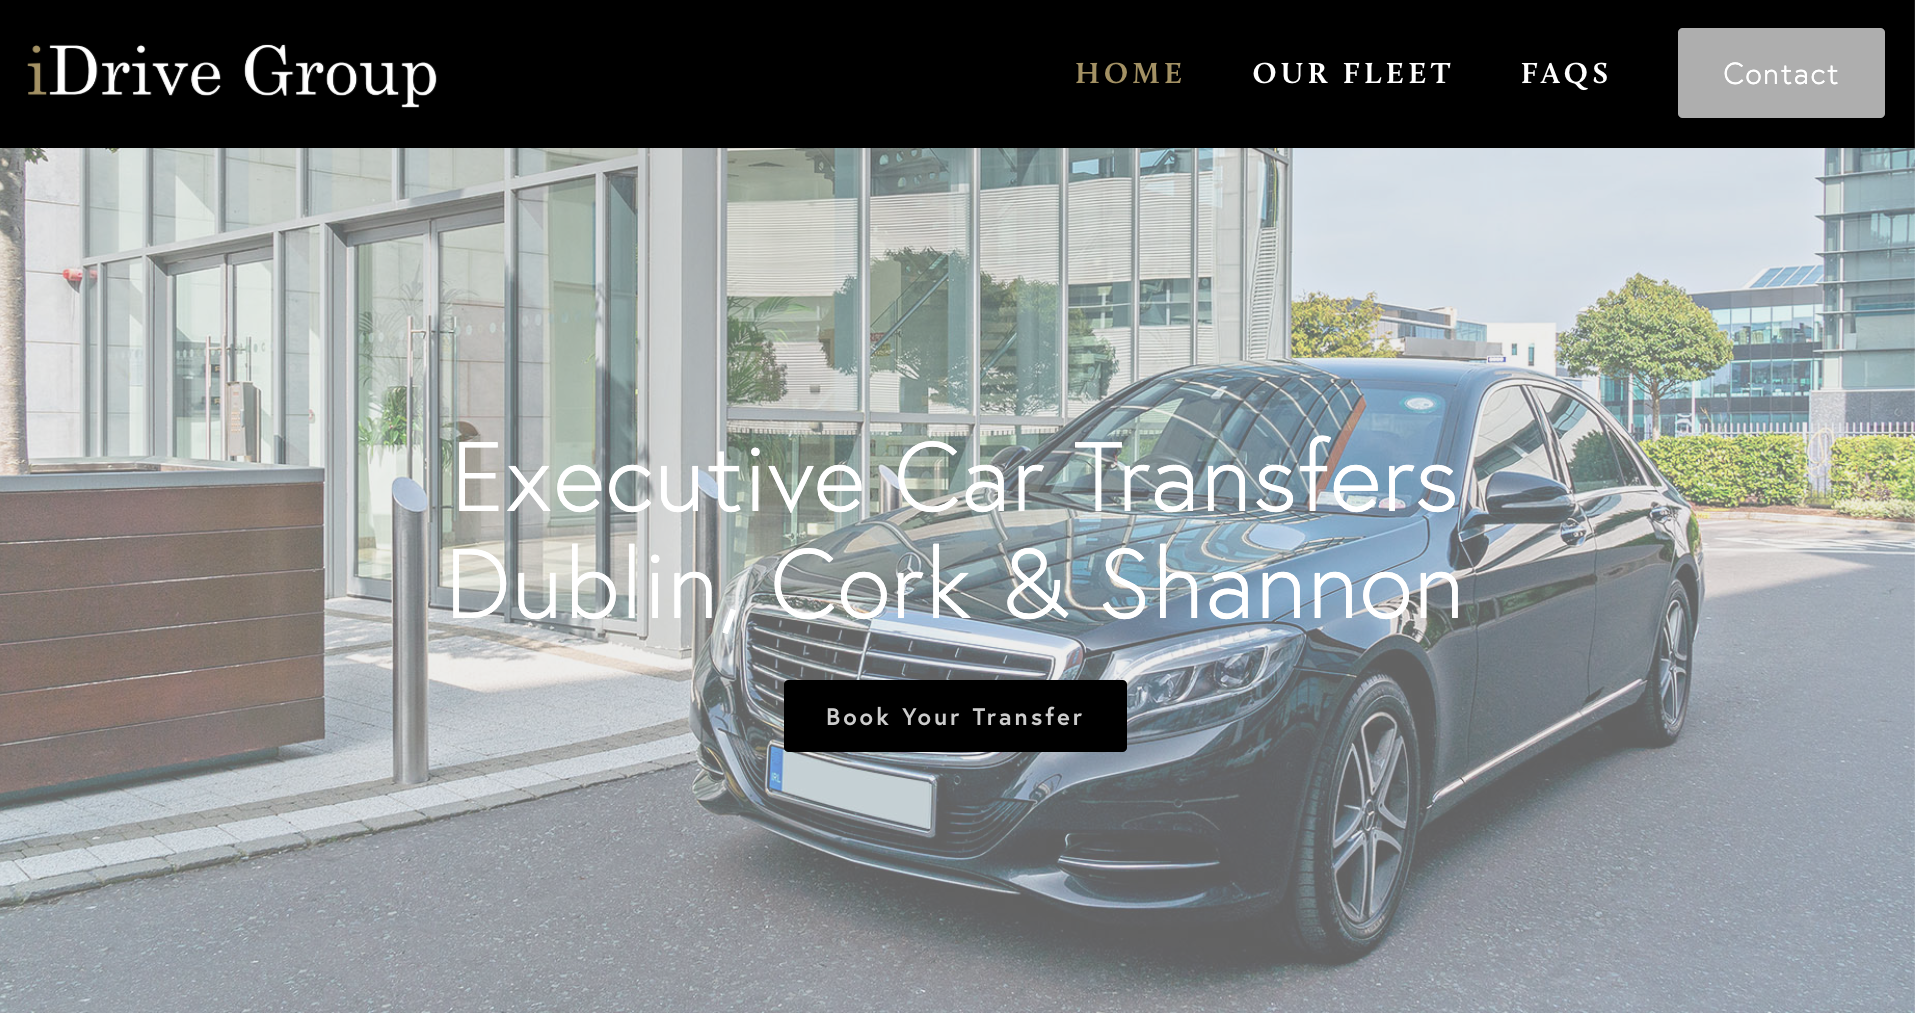 iDrive Group—Executive Car Transfers